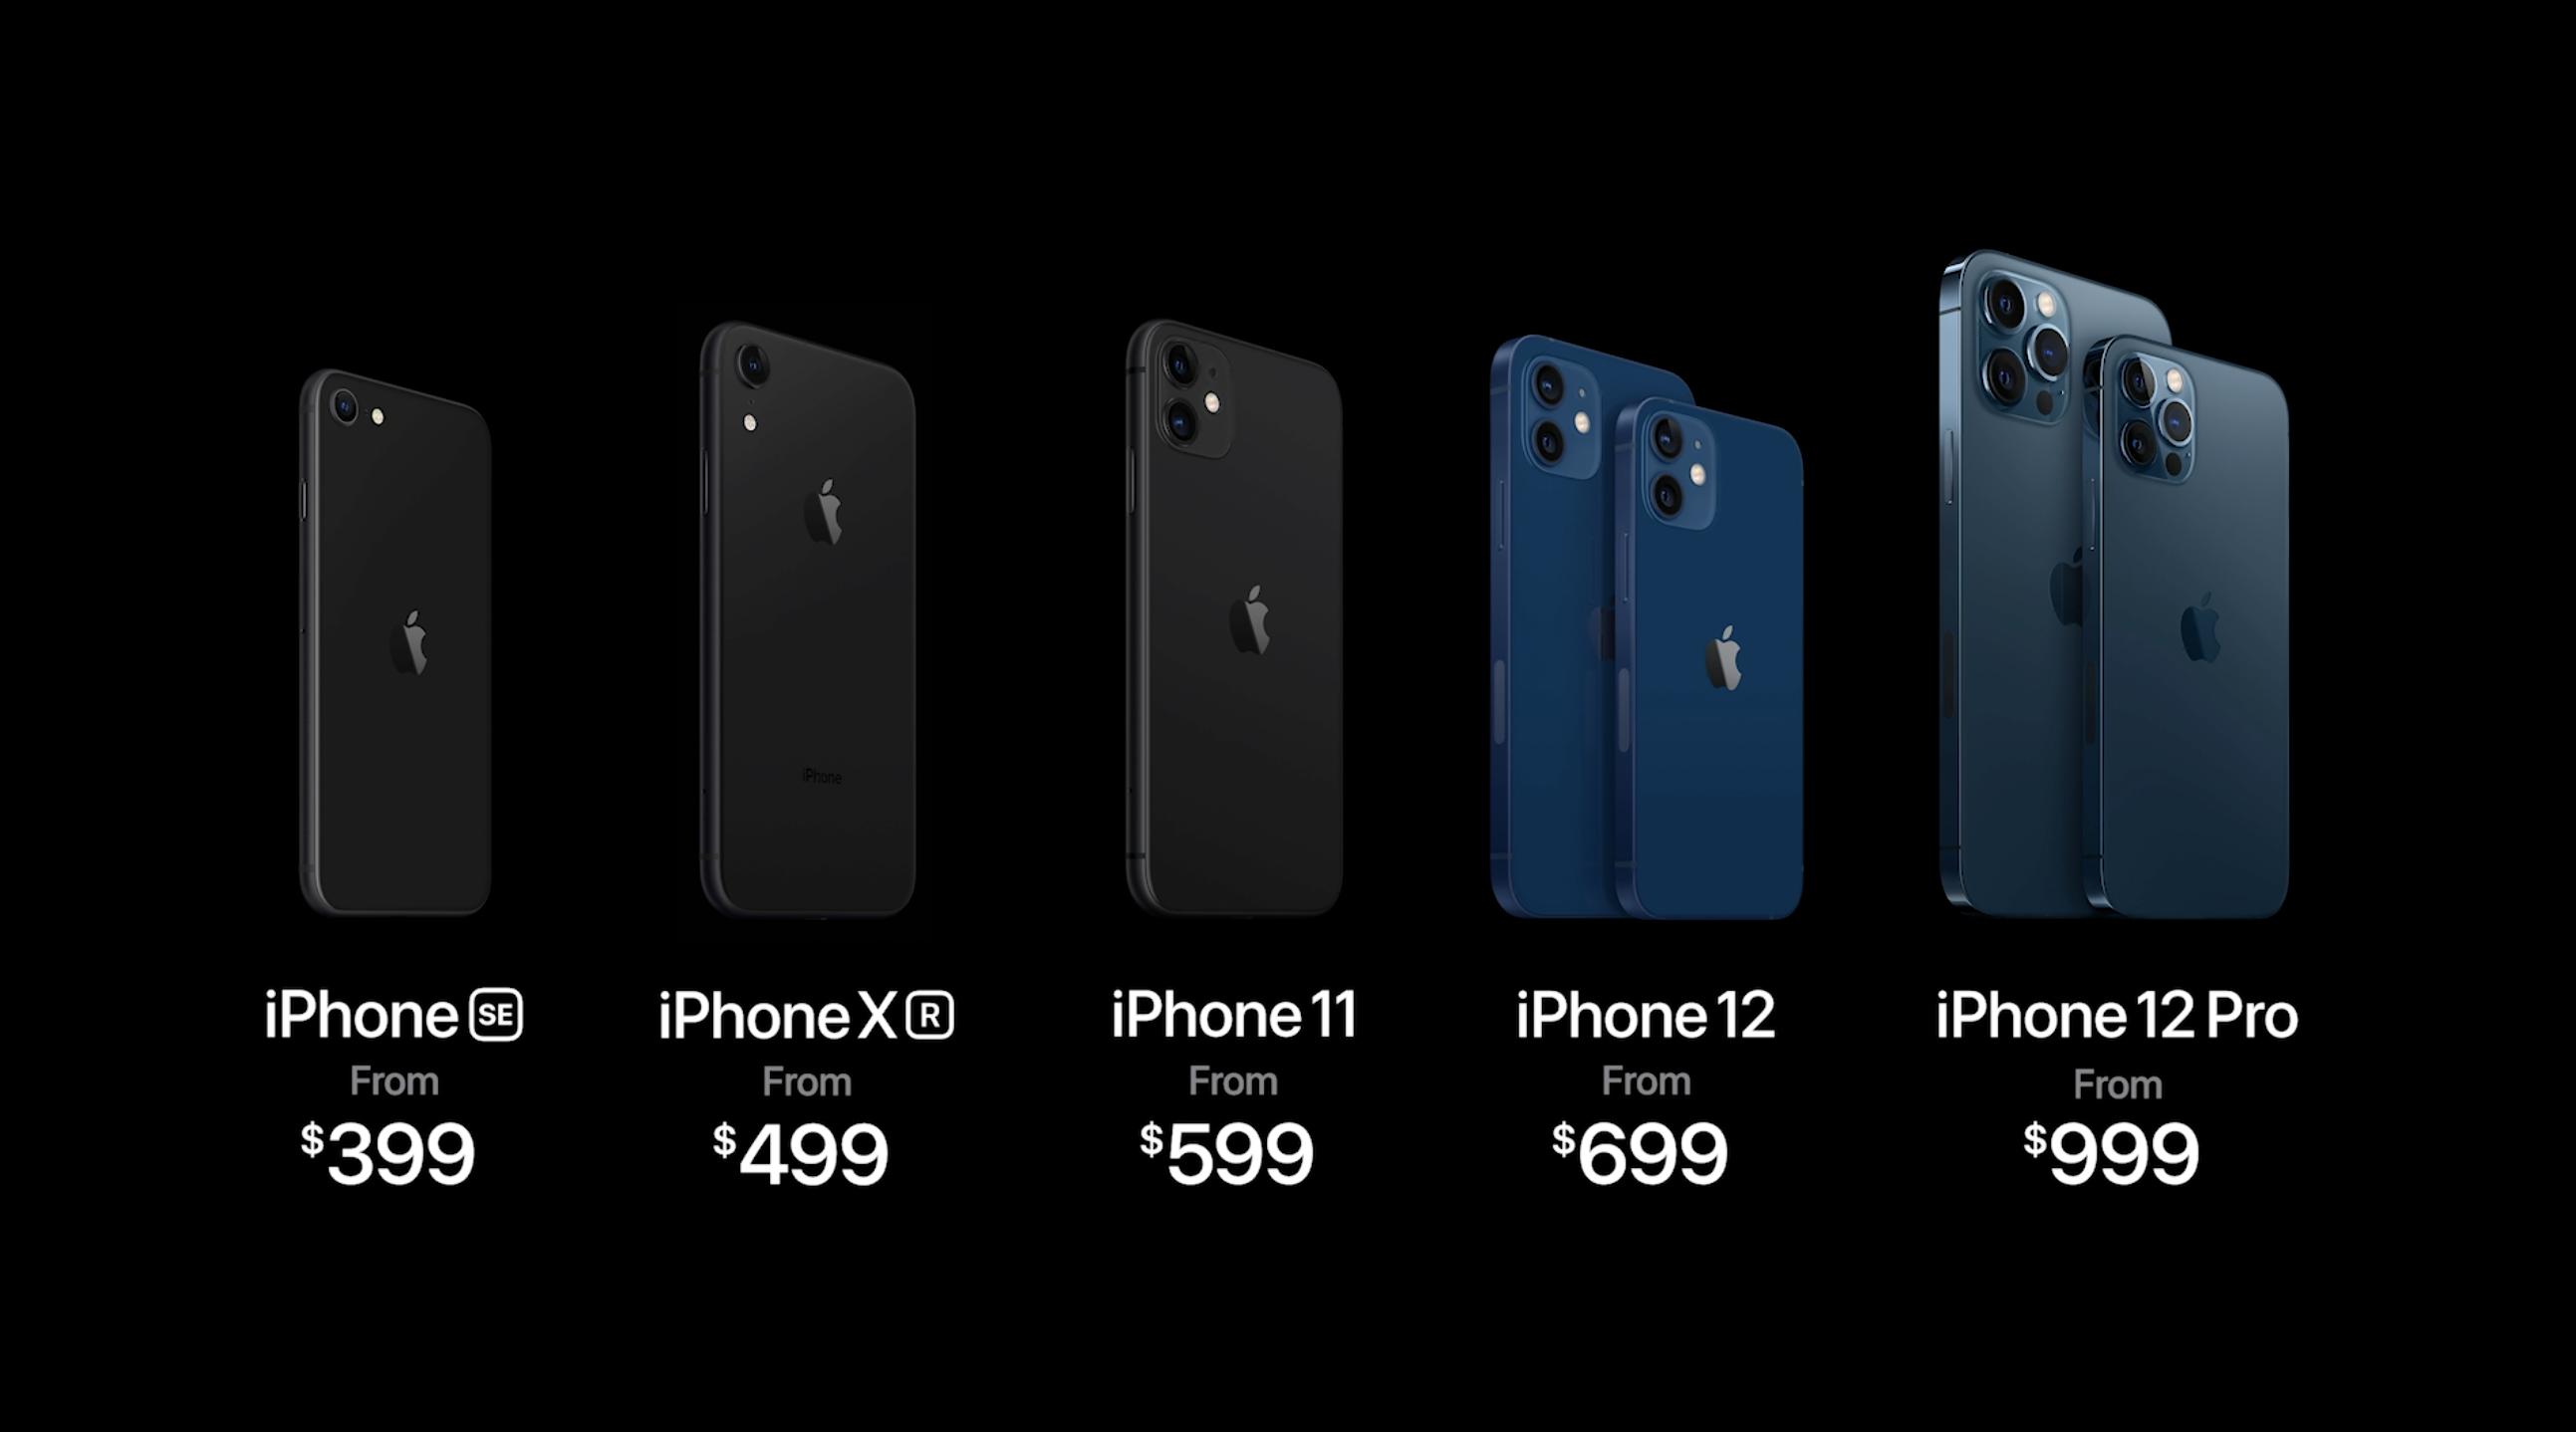 2020 full iPhone lineup